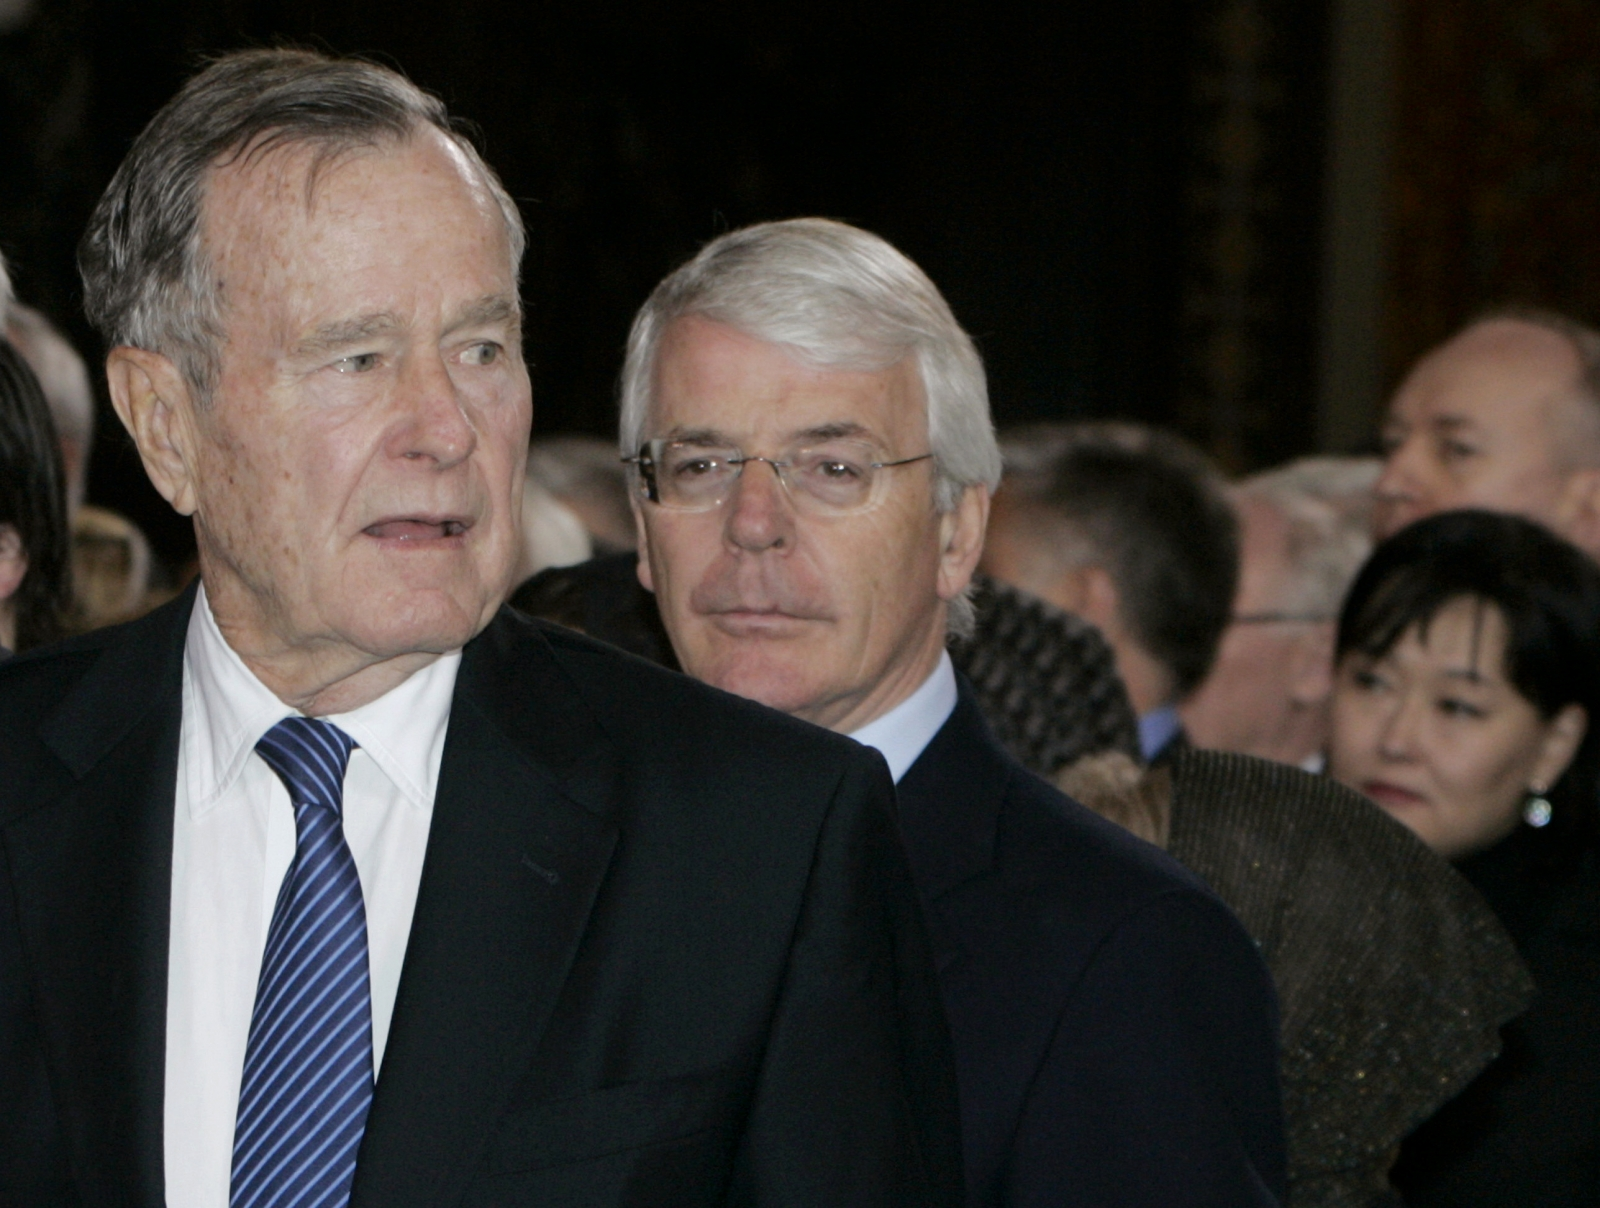 Former U.S. President George Bush (L) and former British Prime Minister Sir John Major